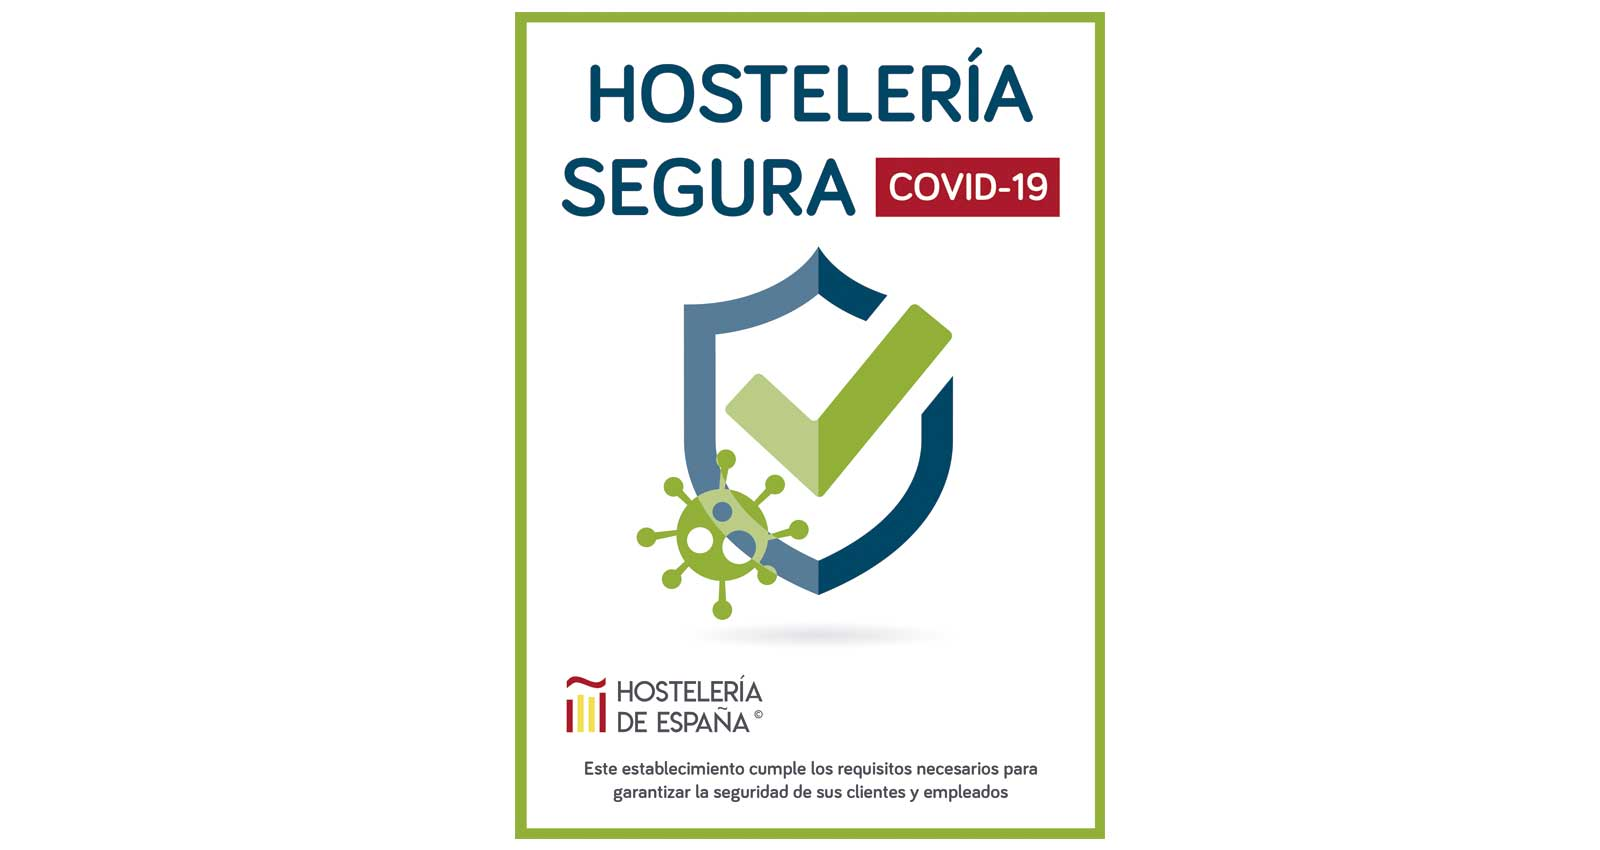 Hostelería de España lanza un sistema de acreditación de locales seguros